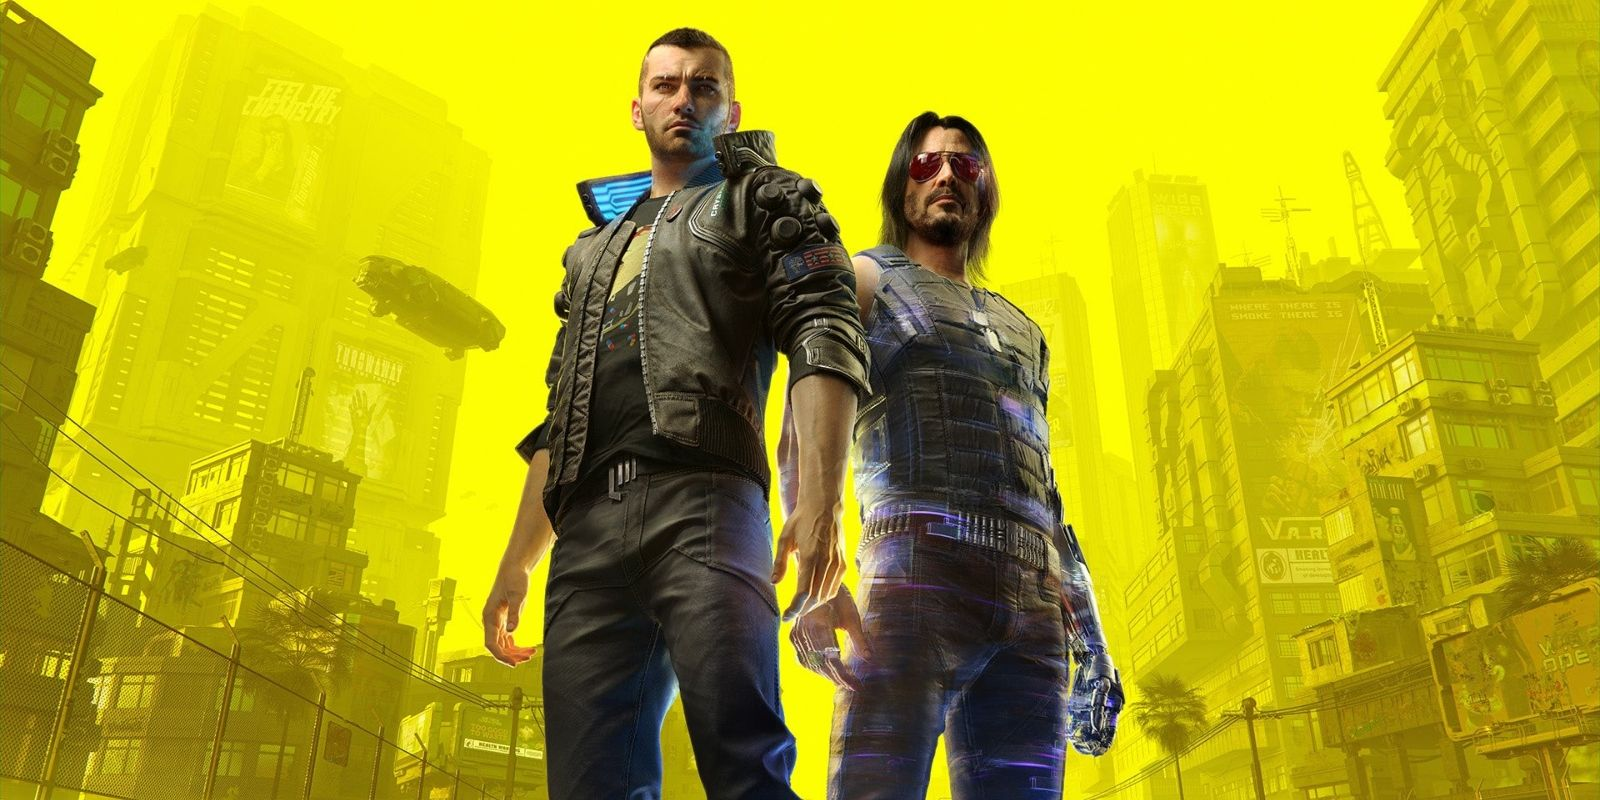 Cyberpunk 2077's Braindance Will Change the Way Games Can Build Worlds